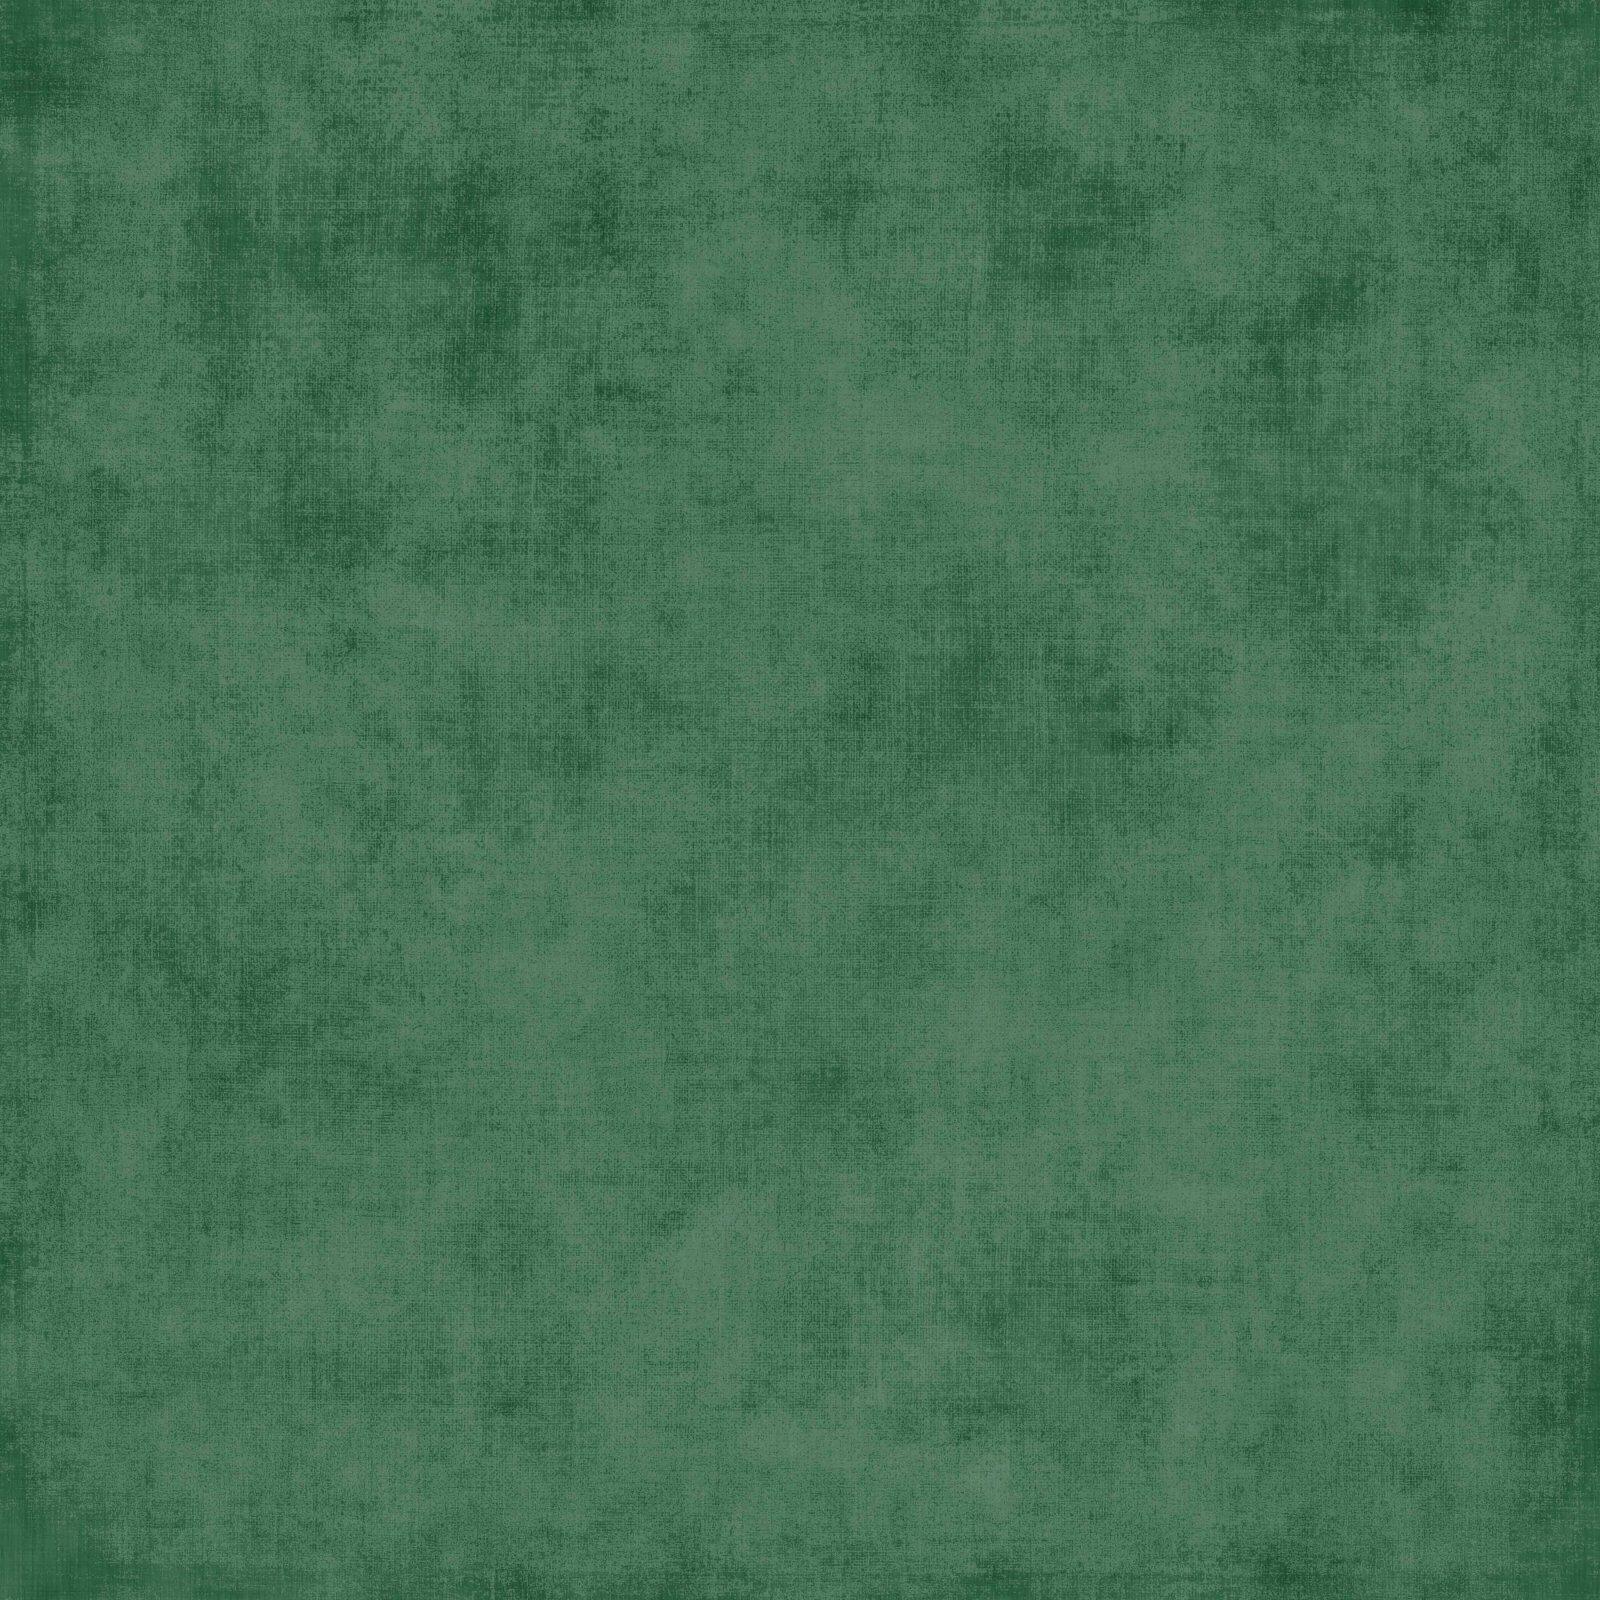 Basic Shade - Alpine Fabric